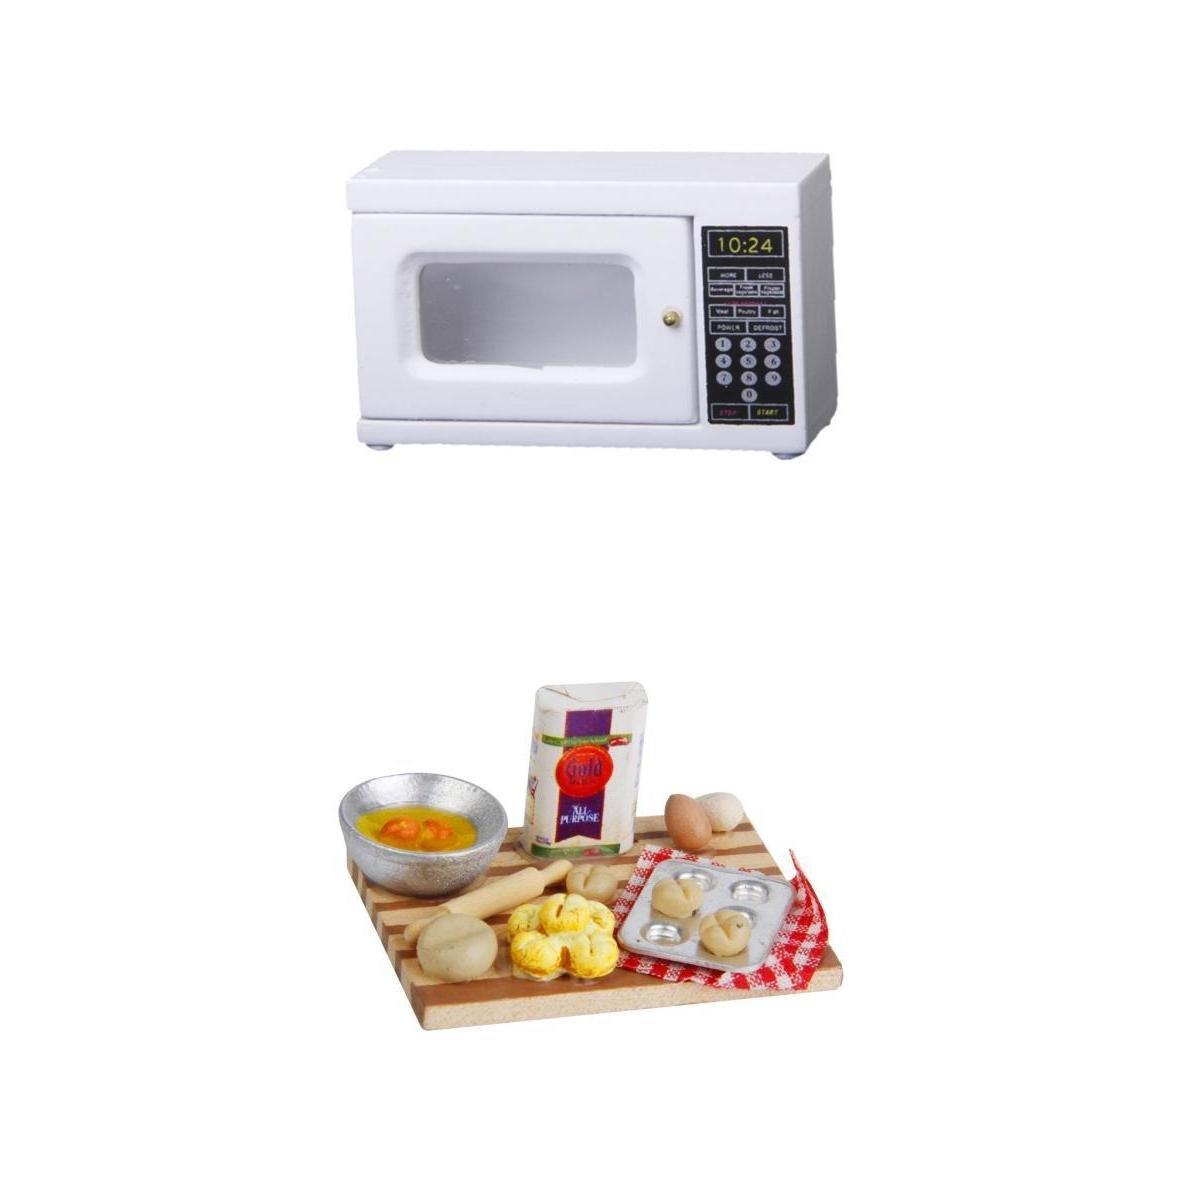 Amazon.es: non-brand 1/12 Dollhouse Miniature Kitchen Decor Micro ...